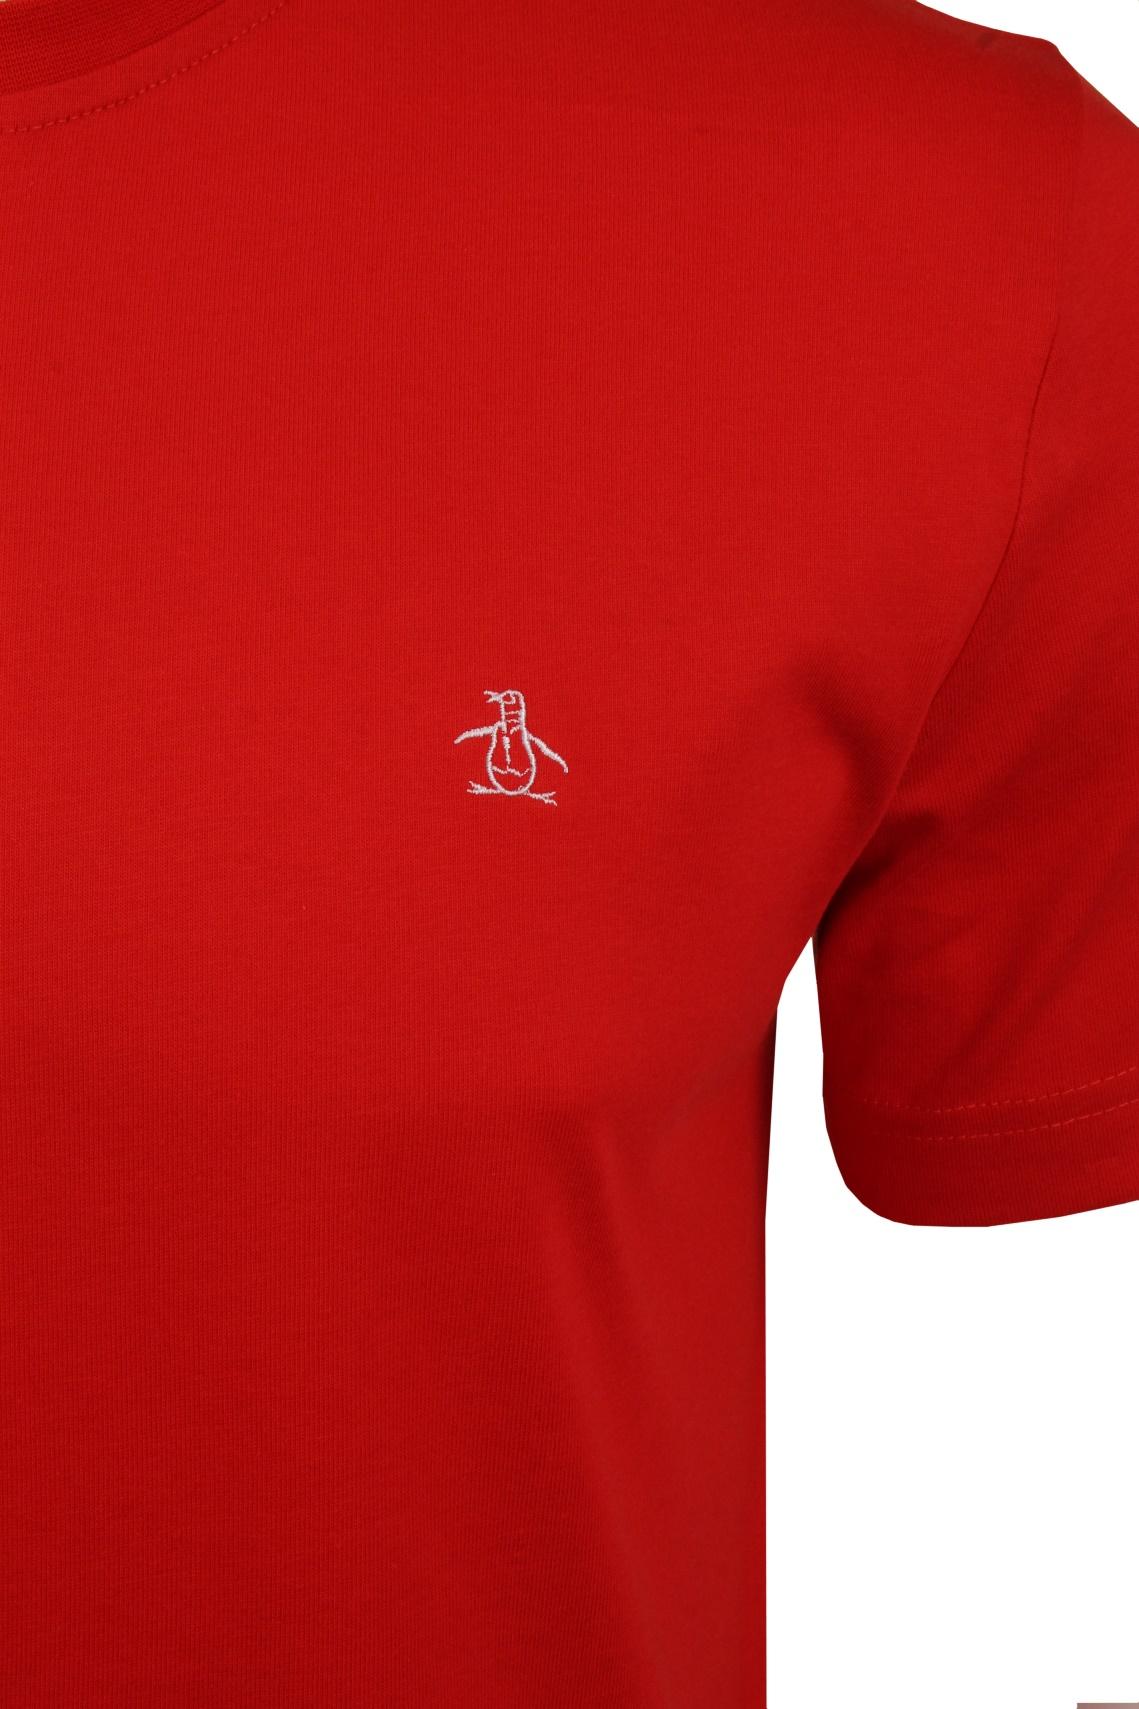 Mens-T-Shirt-by-Original-Penguin-Crew-Neck-Short-Sleeved thumbnail 25